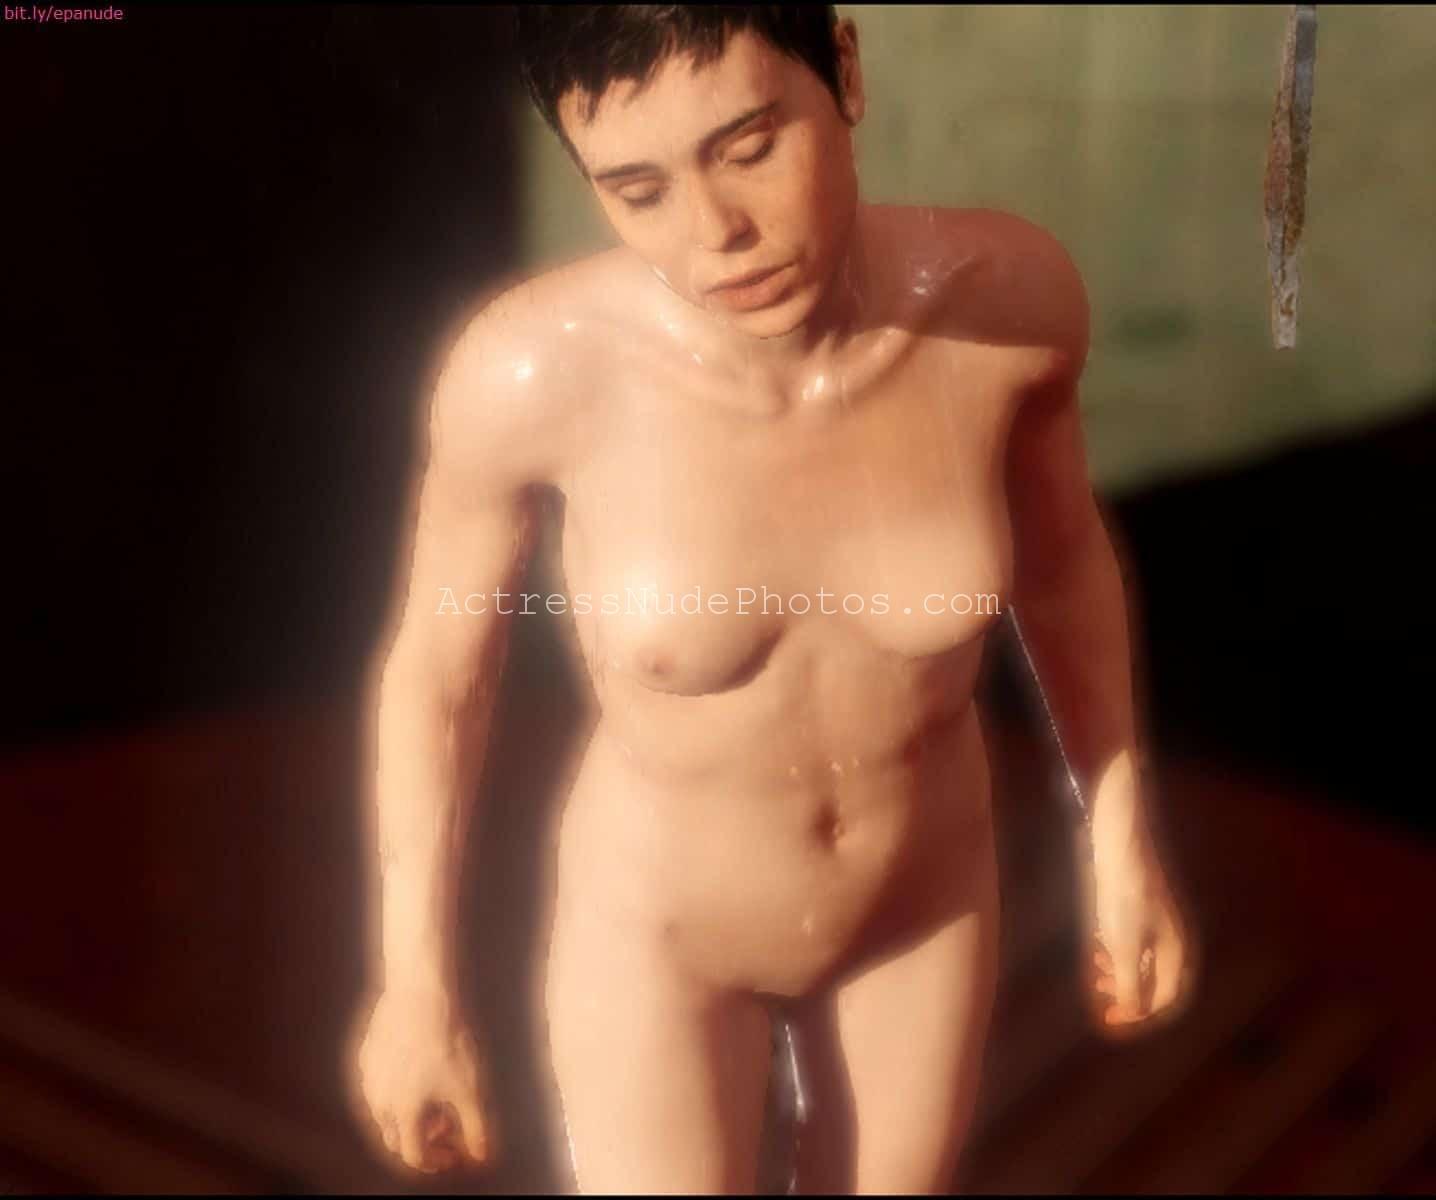 dahlia dark tits and ass